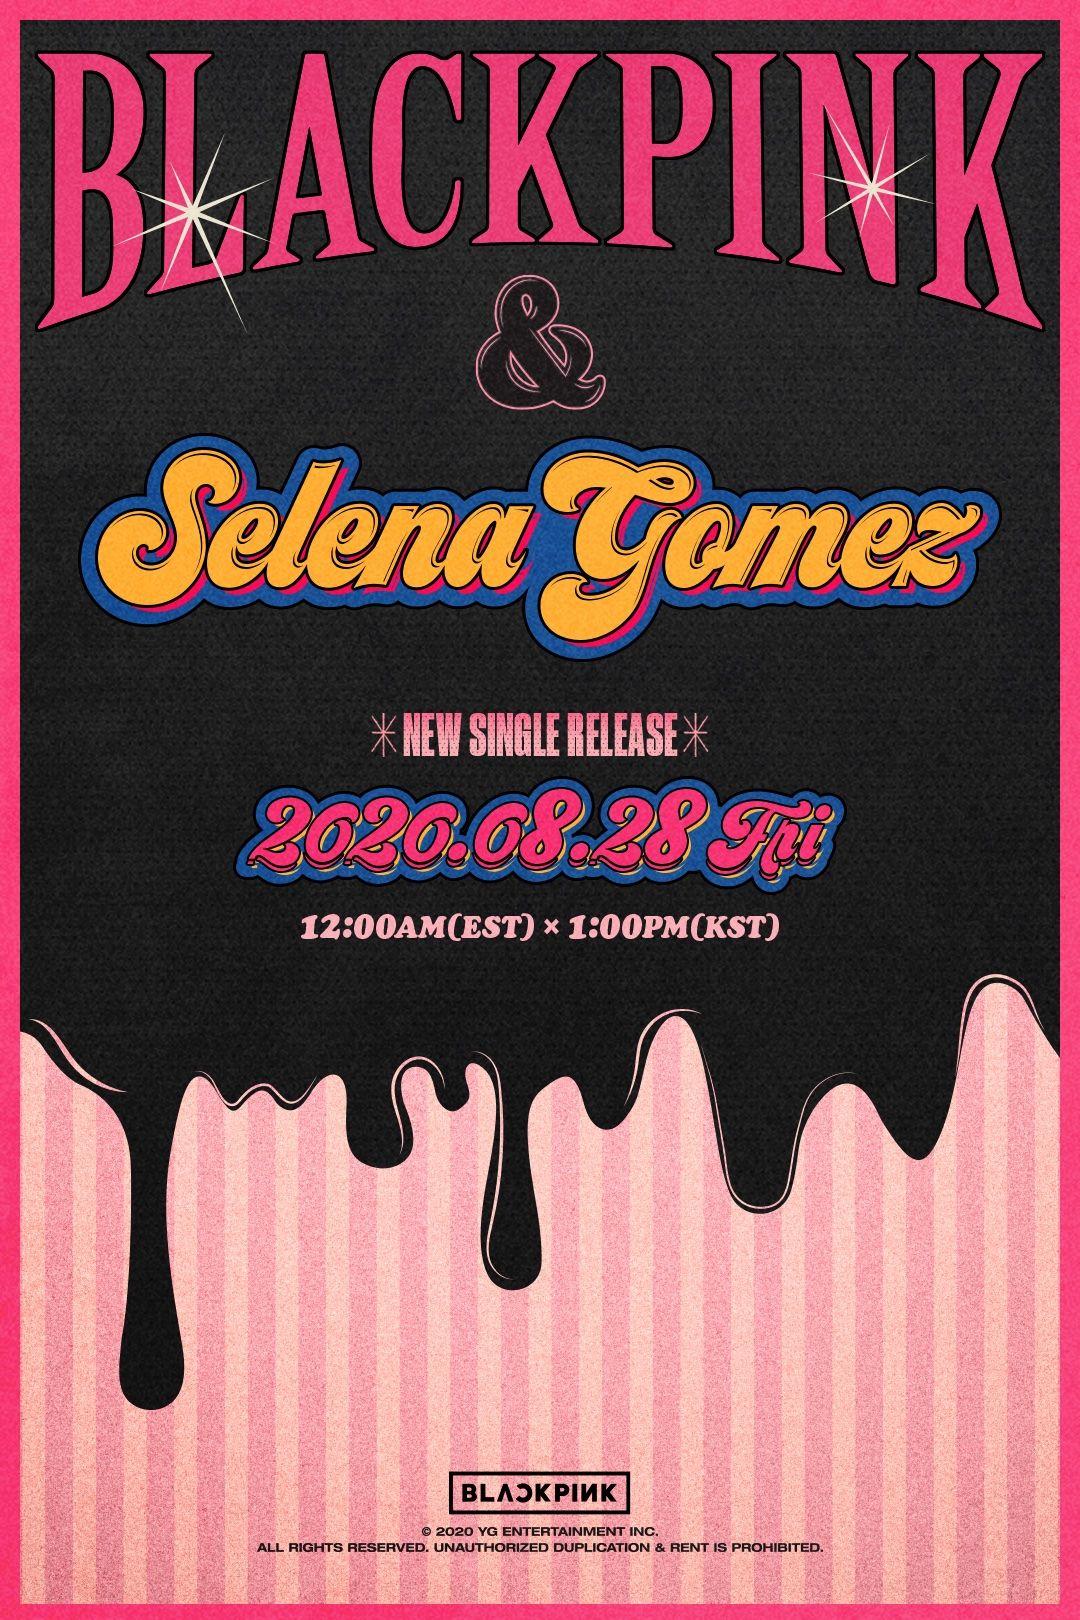 "BLACKPINKOFFICIAL on Twitter: ""#BLACKPINK #블랙핑크 #SelenaGomez #셀레나고메즈 #NewSingle #TeaserPoster #20200828_12amEST #20200828_1pmKST #ComingSoon #YG"